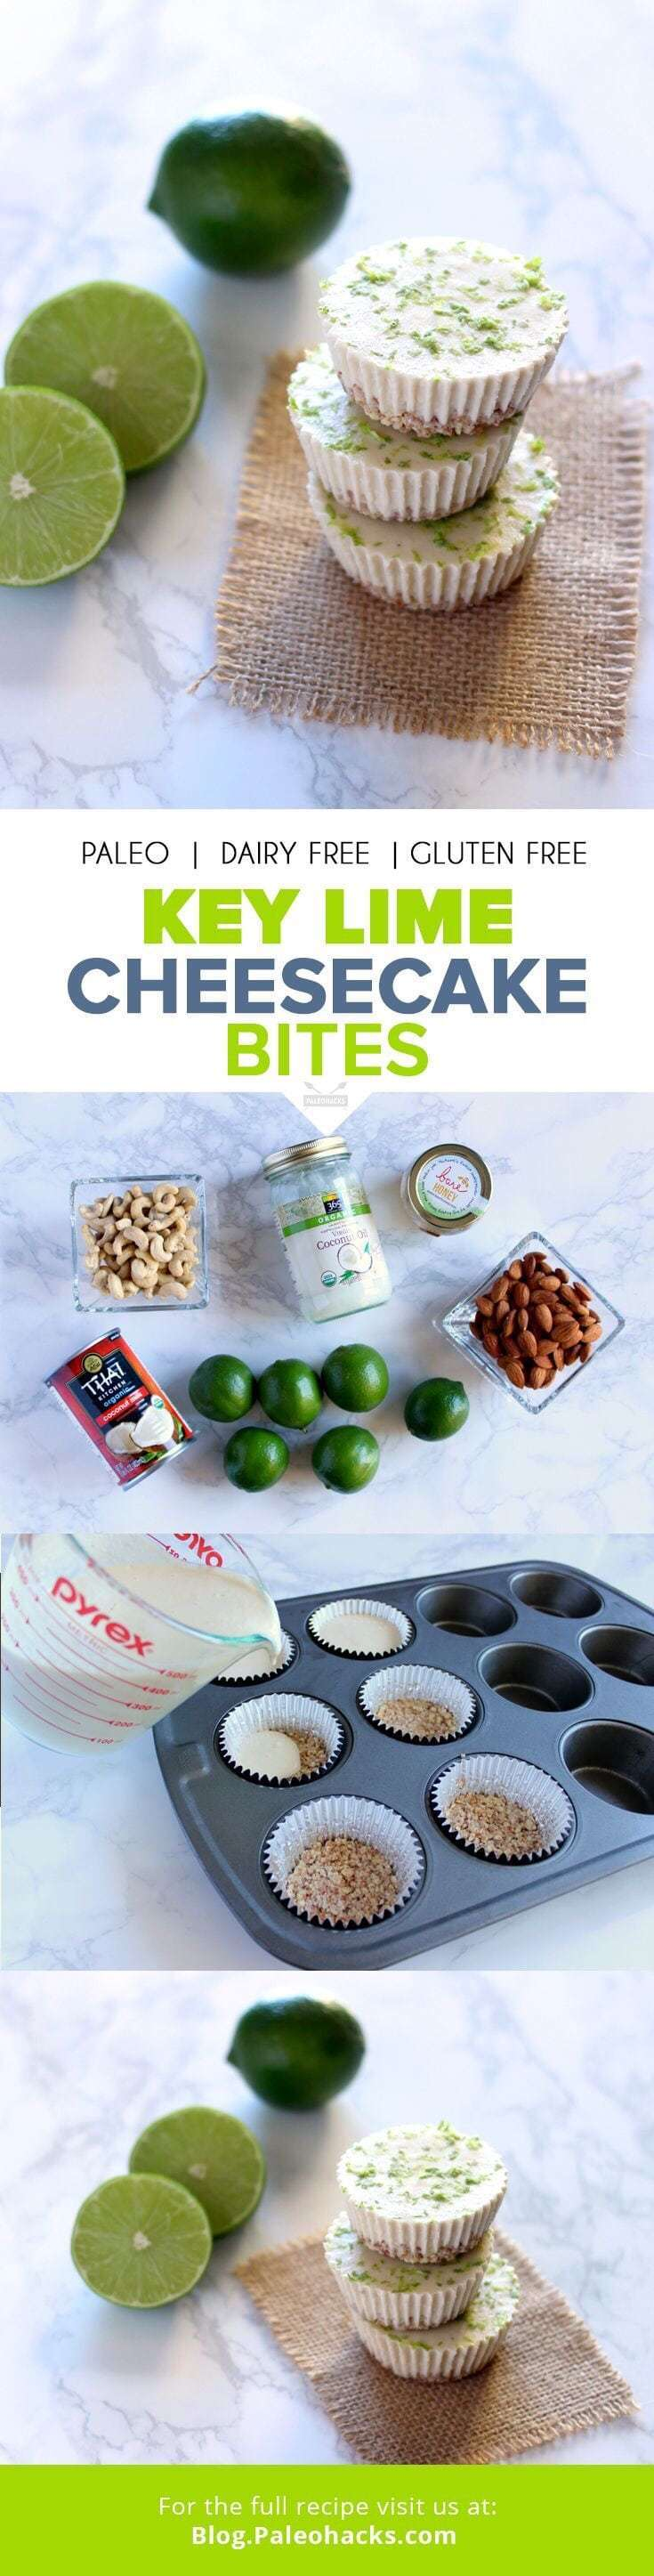 1. Key Lime Cheesecake Bites